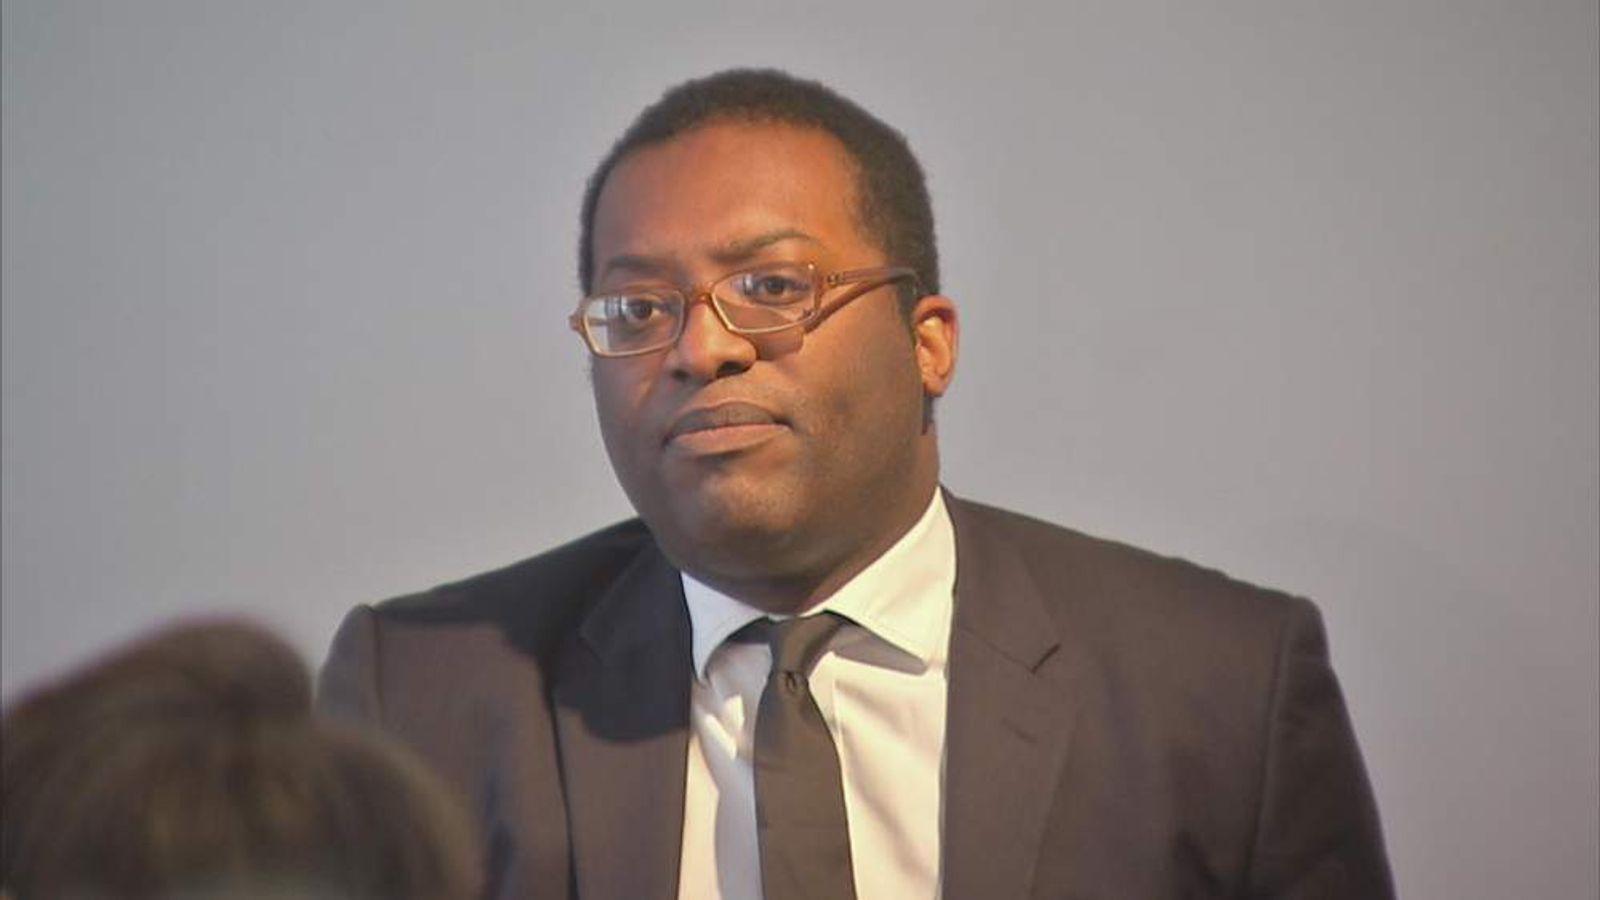 Kwasi Kwarteng Tory MP